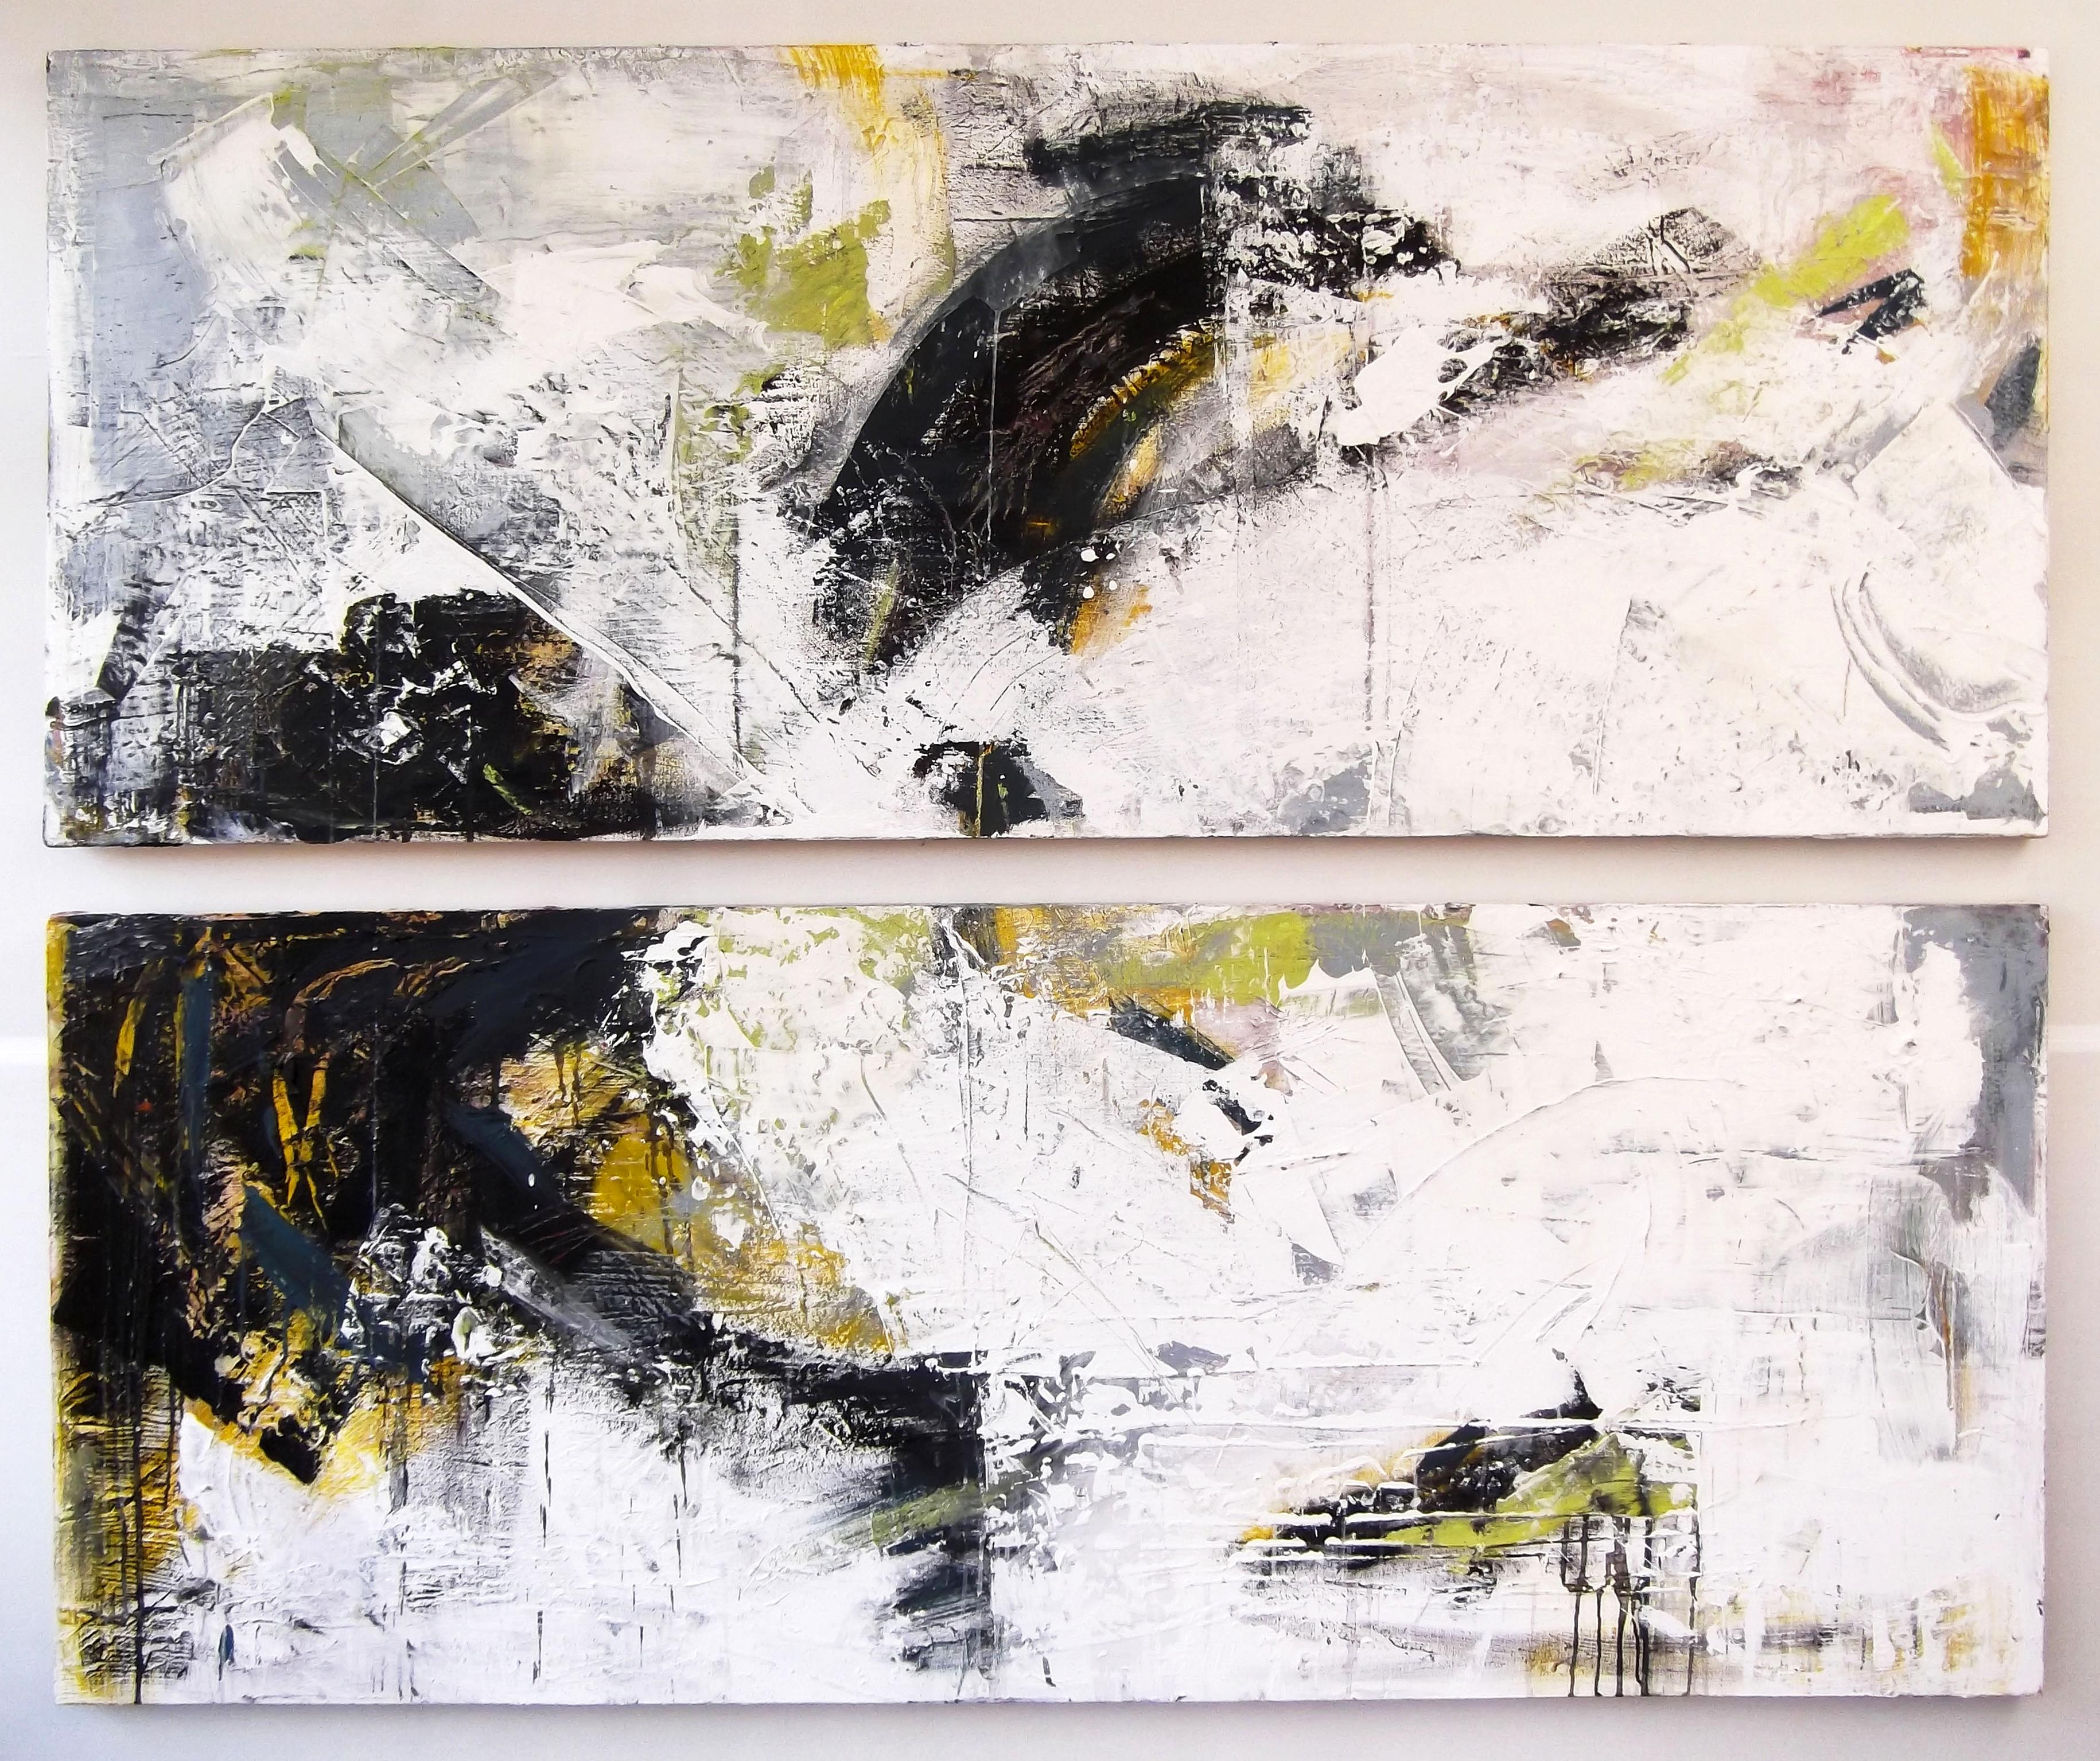 Art Graduates Prize 2014 Shortlist Announced Worksinprint